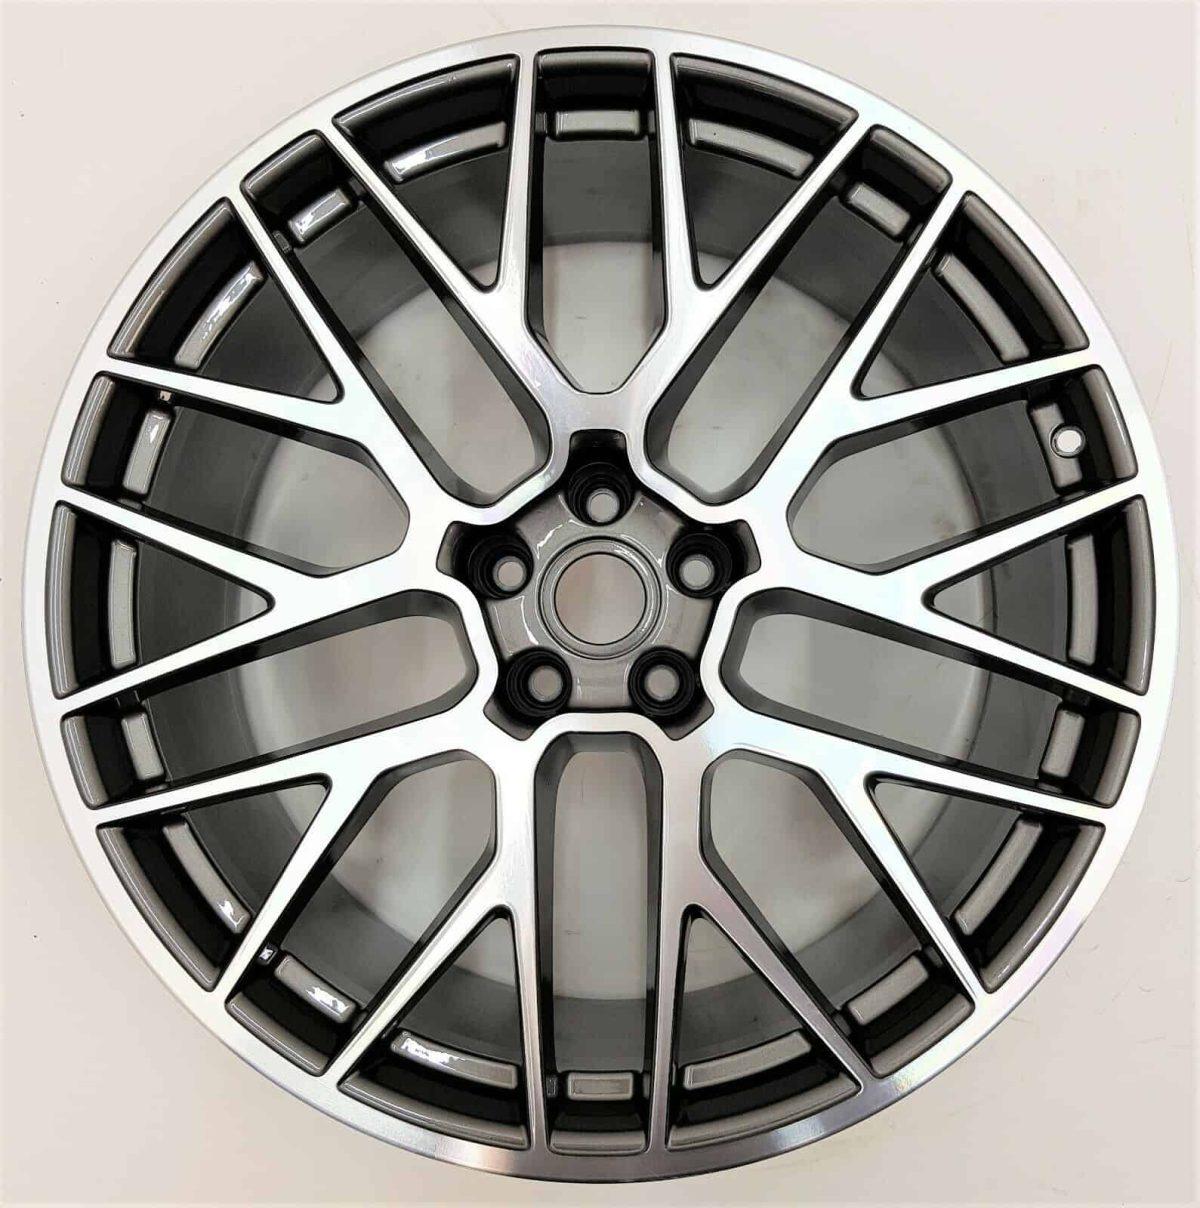 "Genuine Porsche Macan 95B RS Spyder Spoke 20"" inch Alloy Wheels with Grey & Diamond Turned Finish 95B601025BFOC6 95B601025BGOC6"